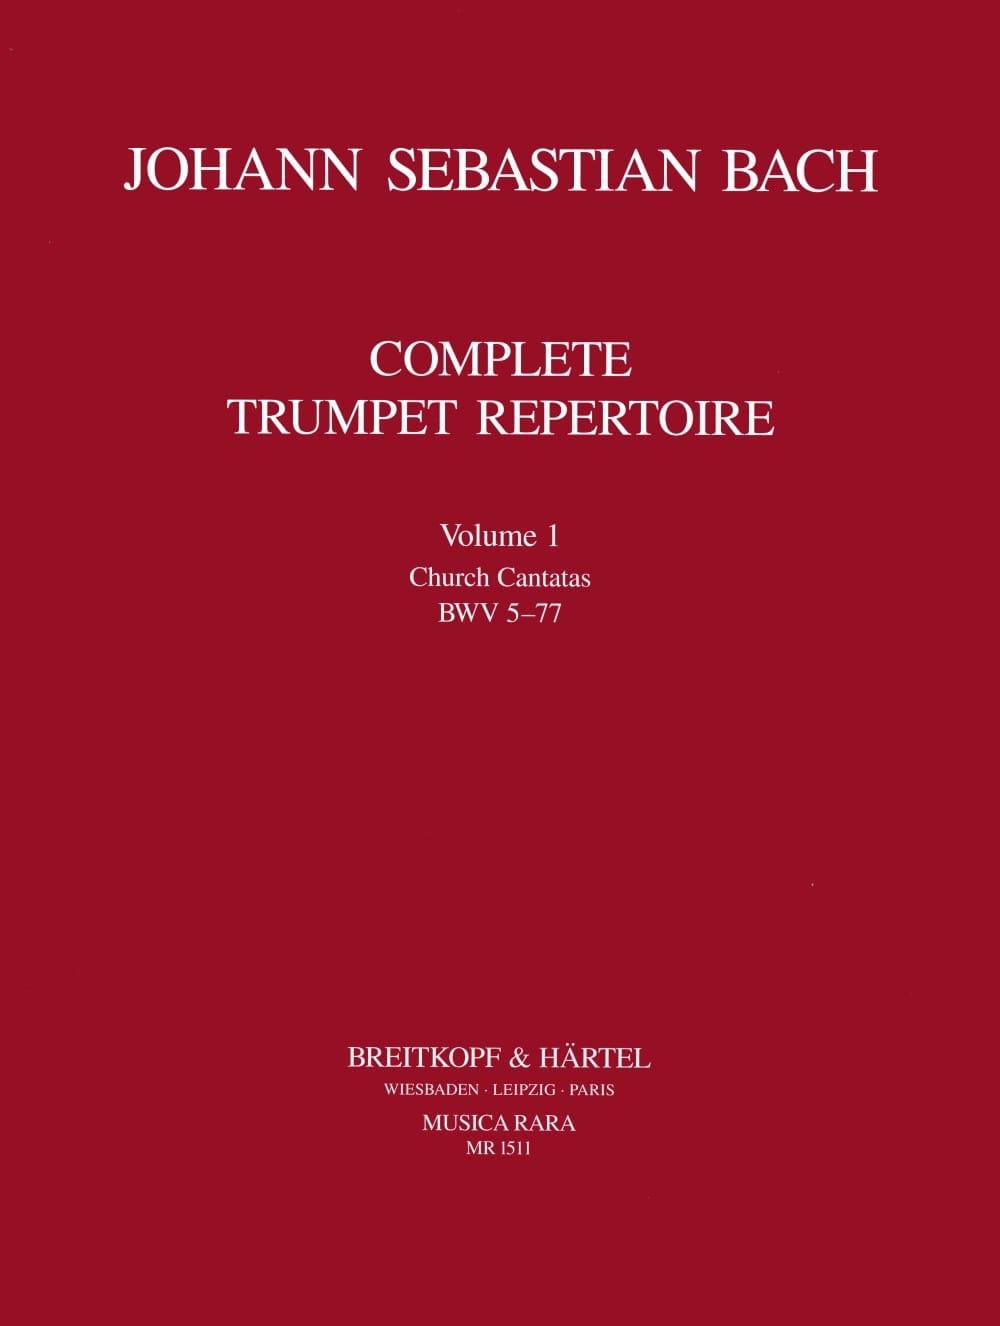 Complete Trumpet Repertoire Volume 1 - BACH - laflutedepan.com